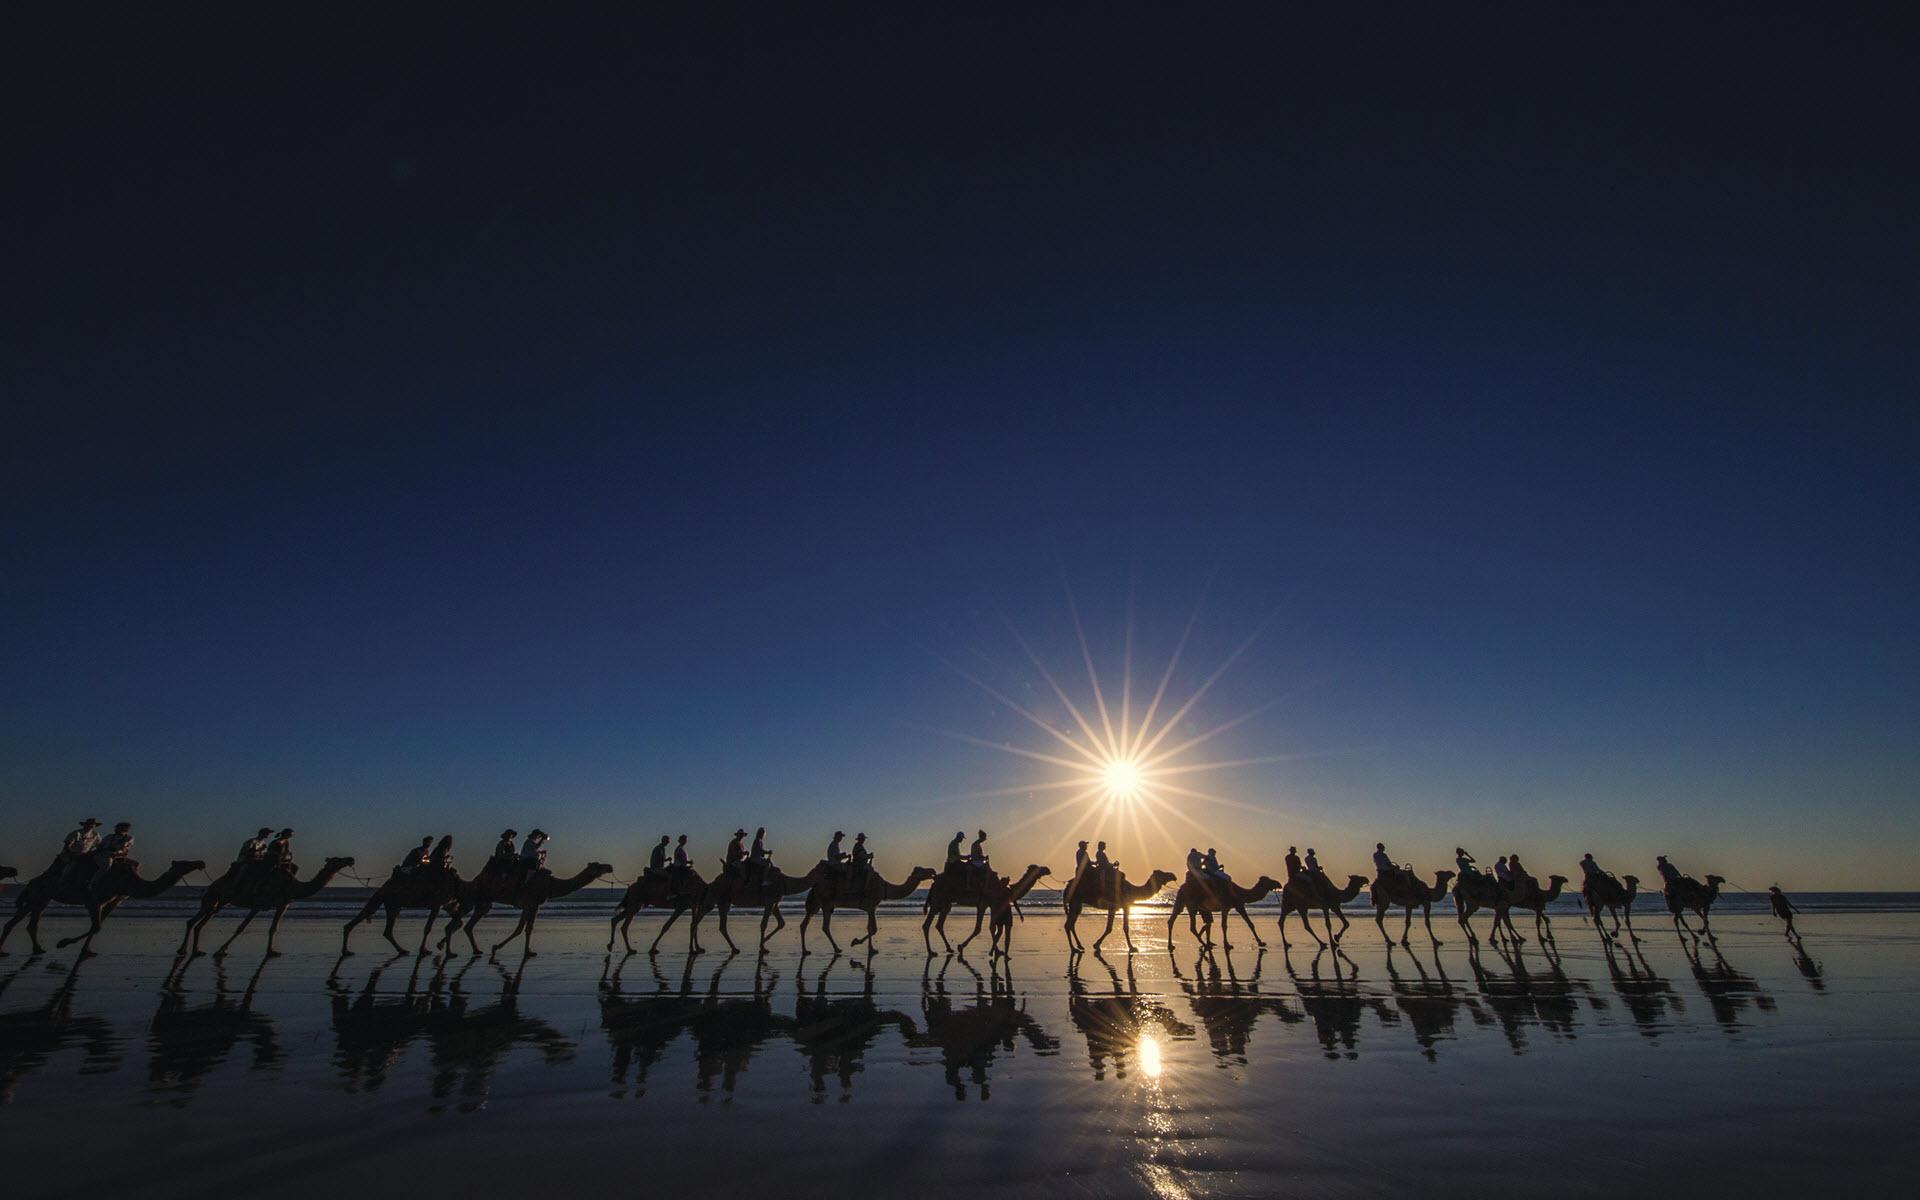 Cable Beach - Broome, Western Australia